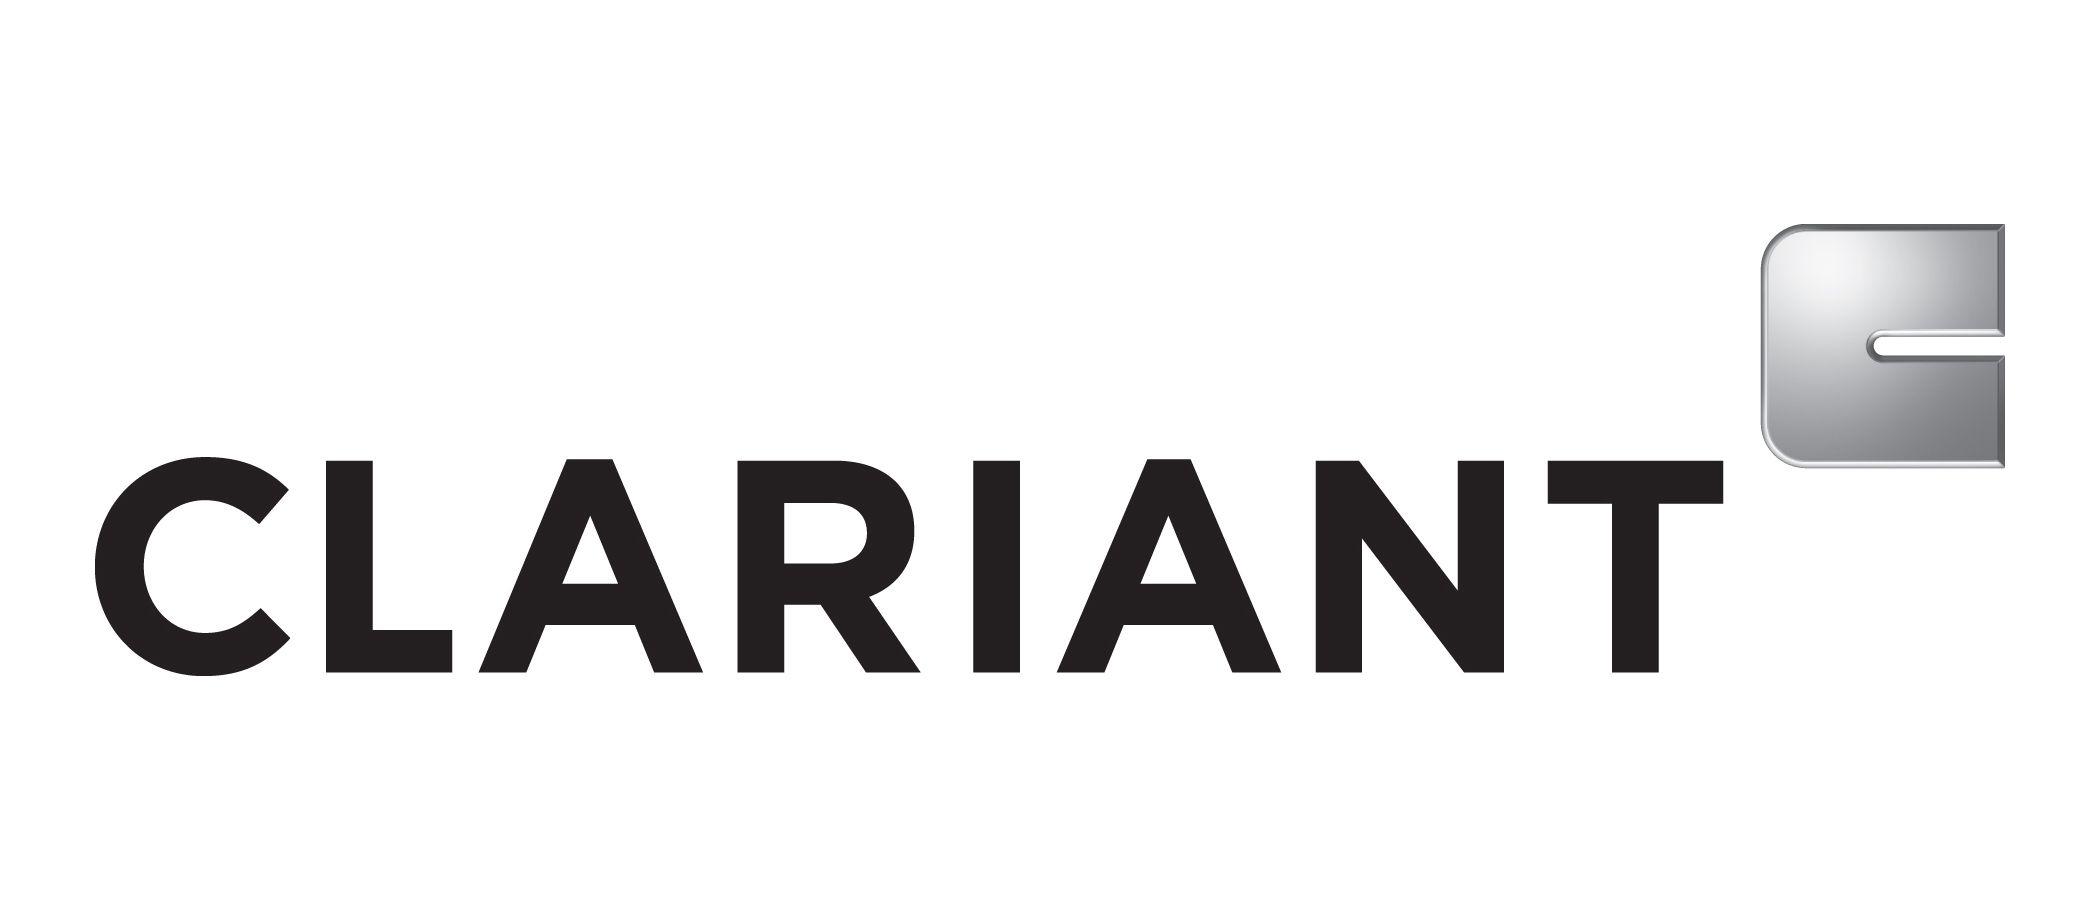 Clariant Corporation